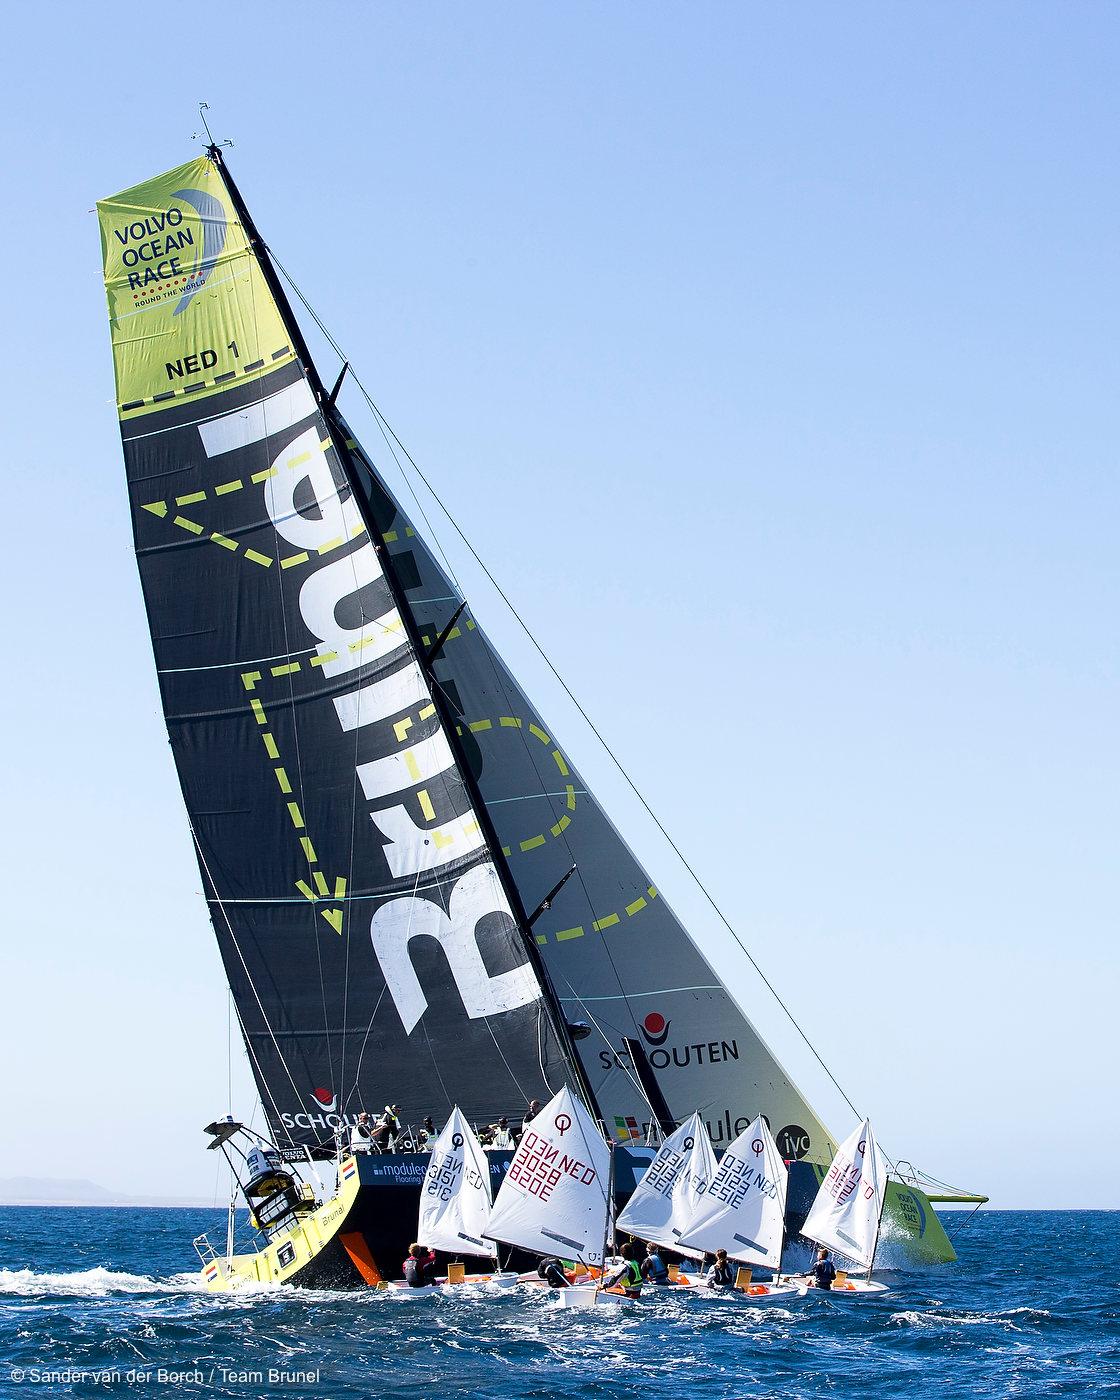 Team Brunel, Lanzarote, Spain